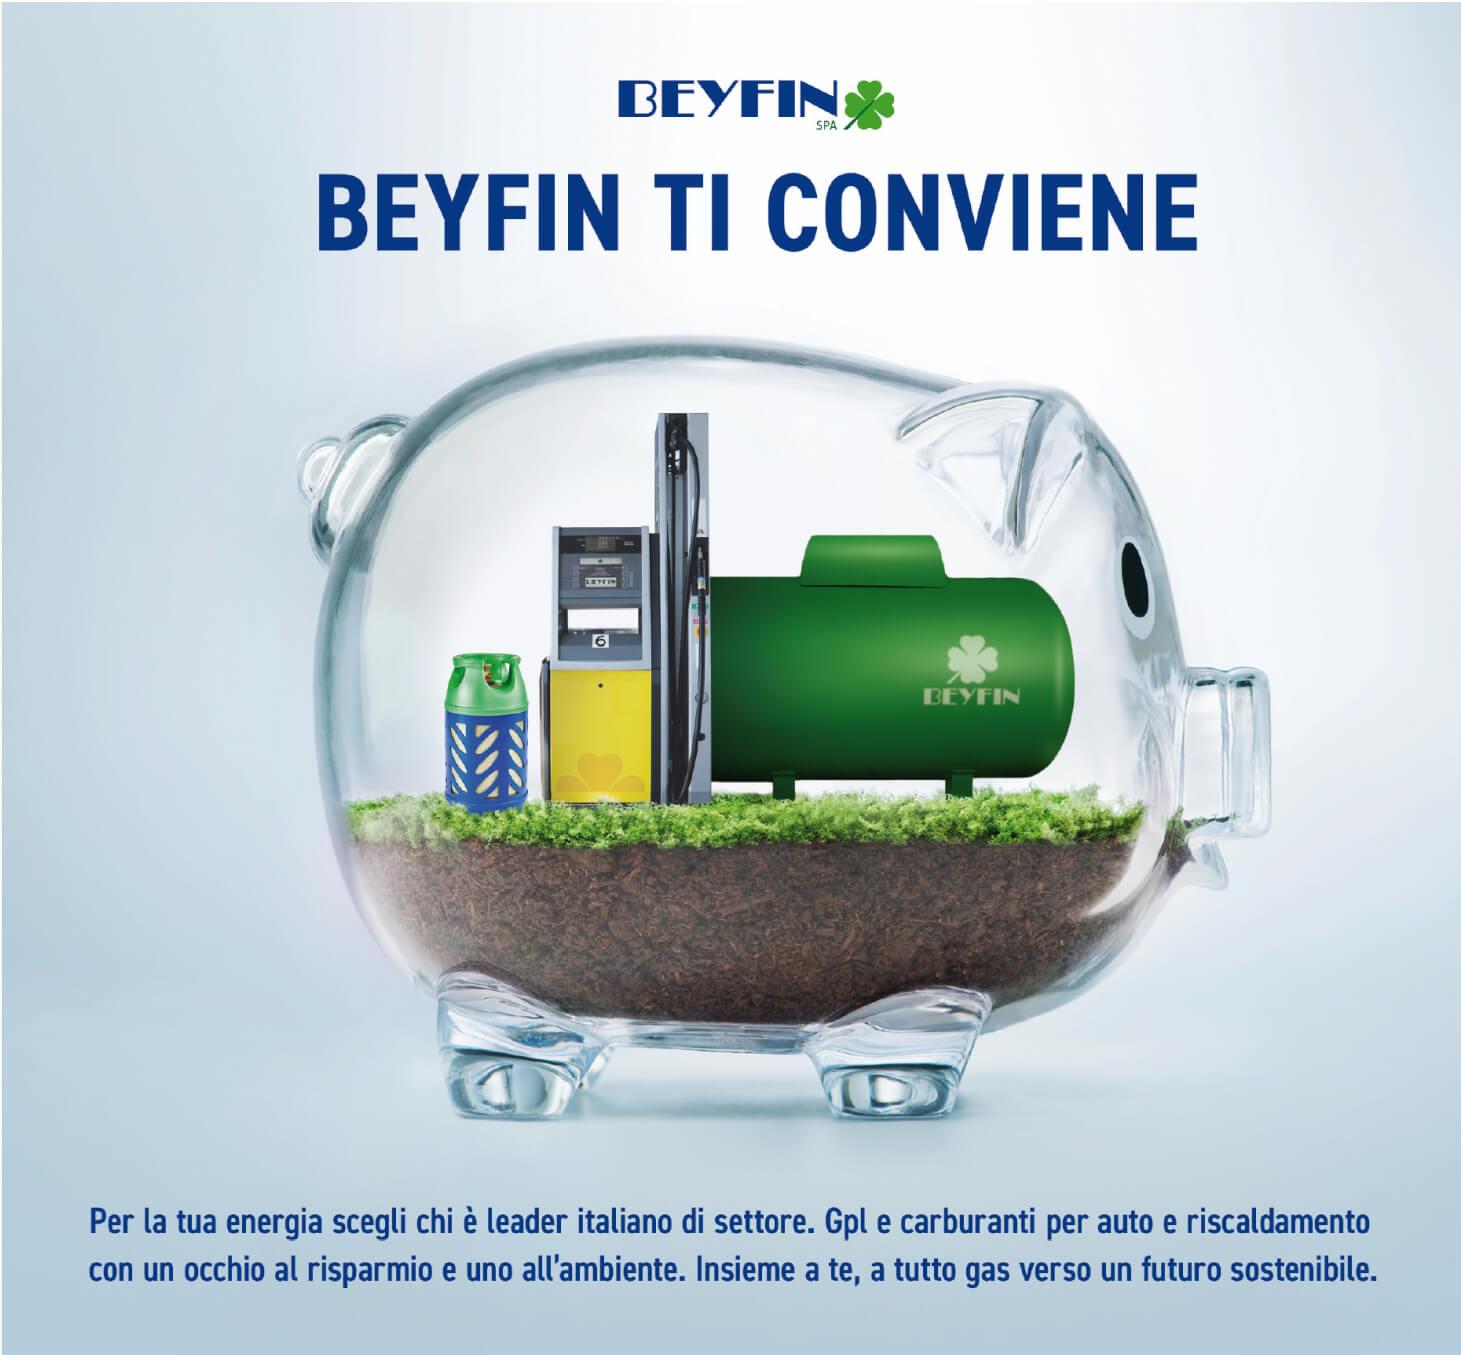 Beyfin-post-2